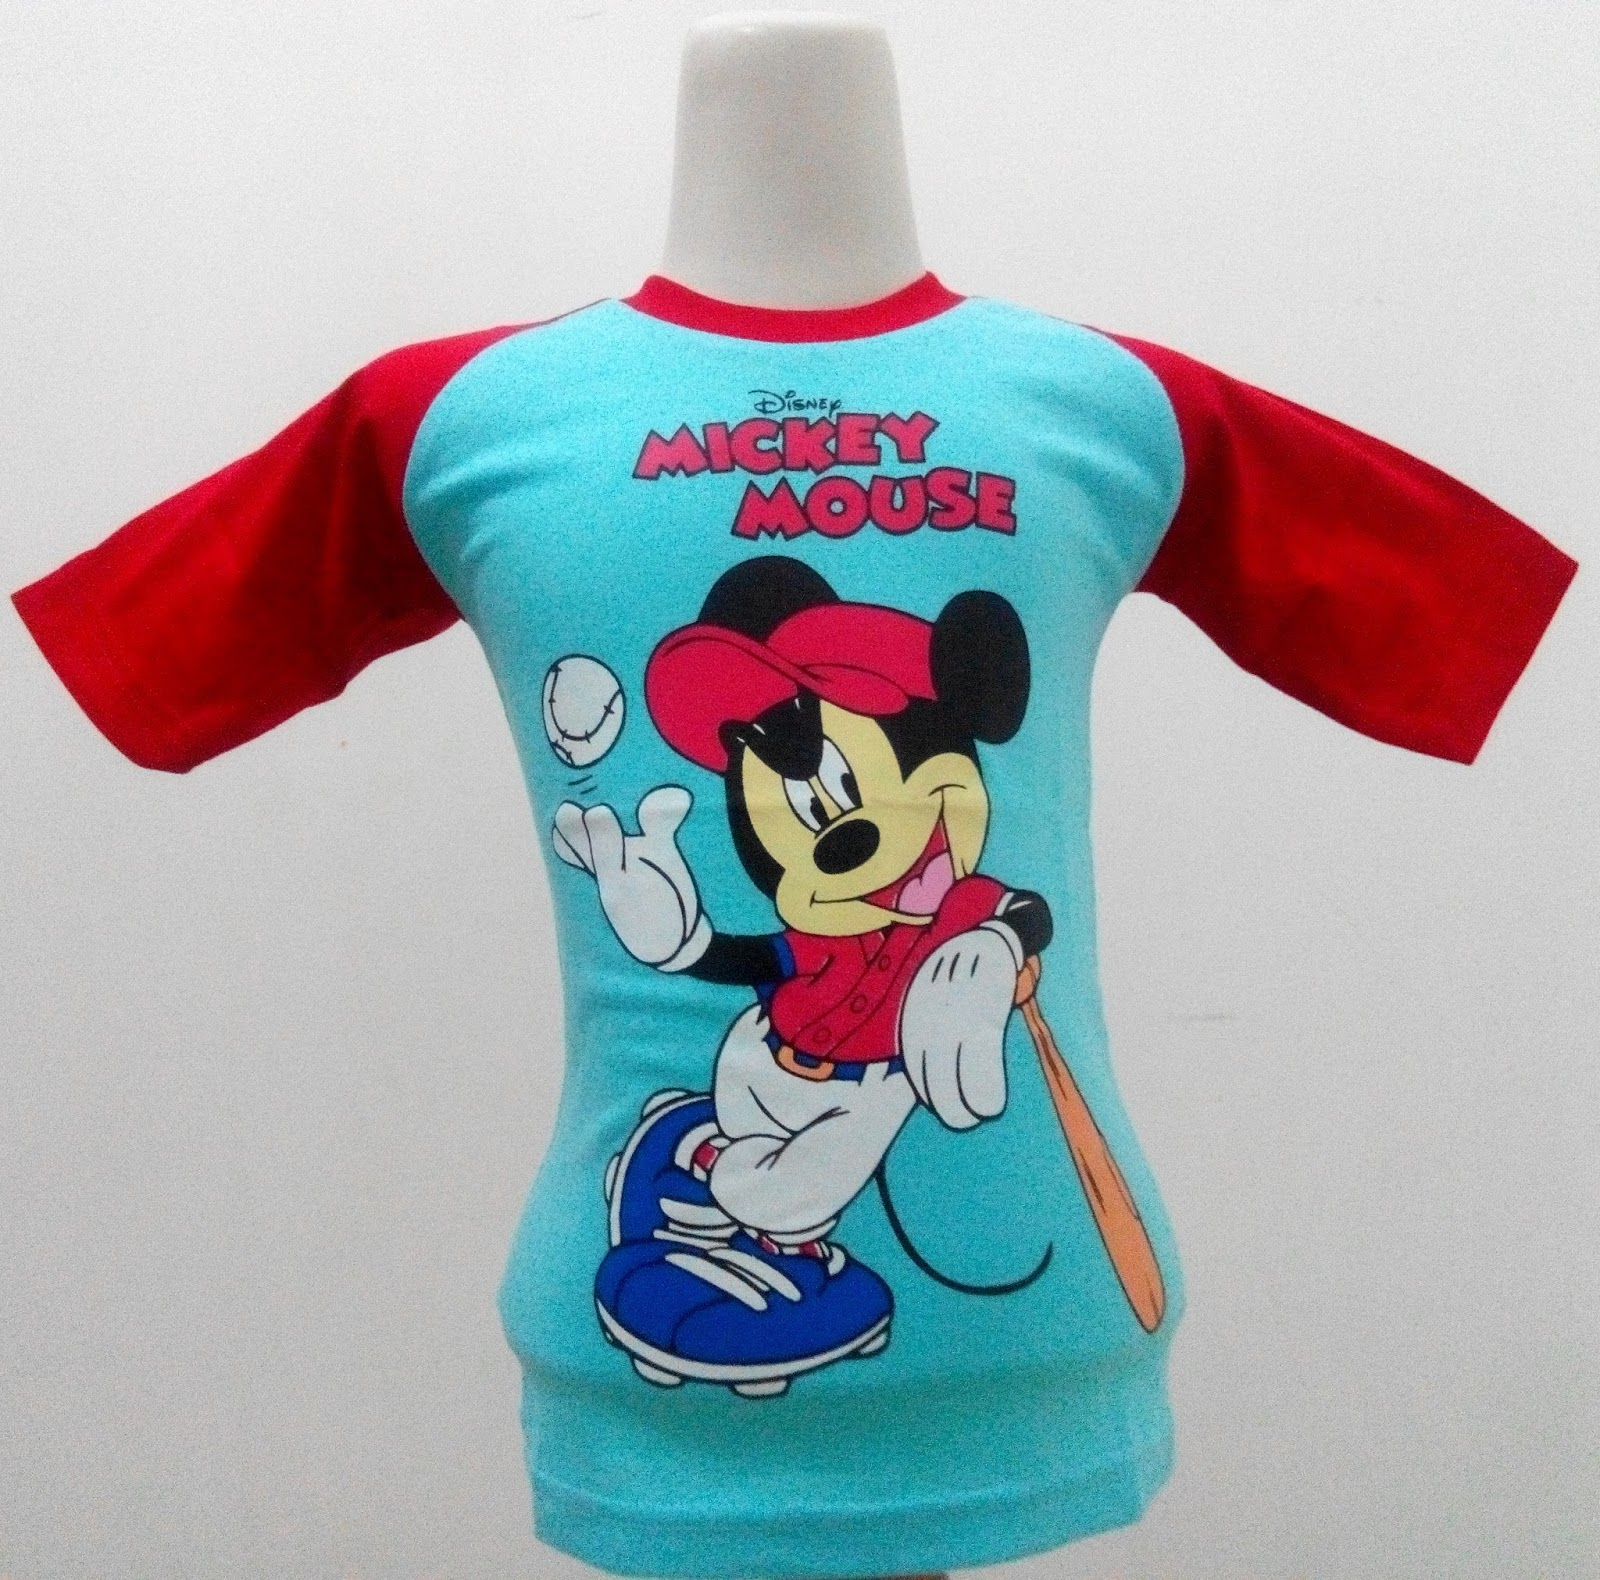 Mickey Mouse 2 Kaos Raglan Anak Karakter Biru Kak Baju Mikimouse